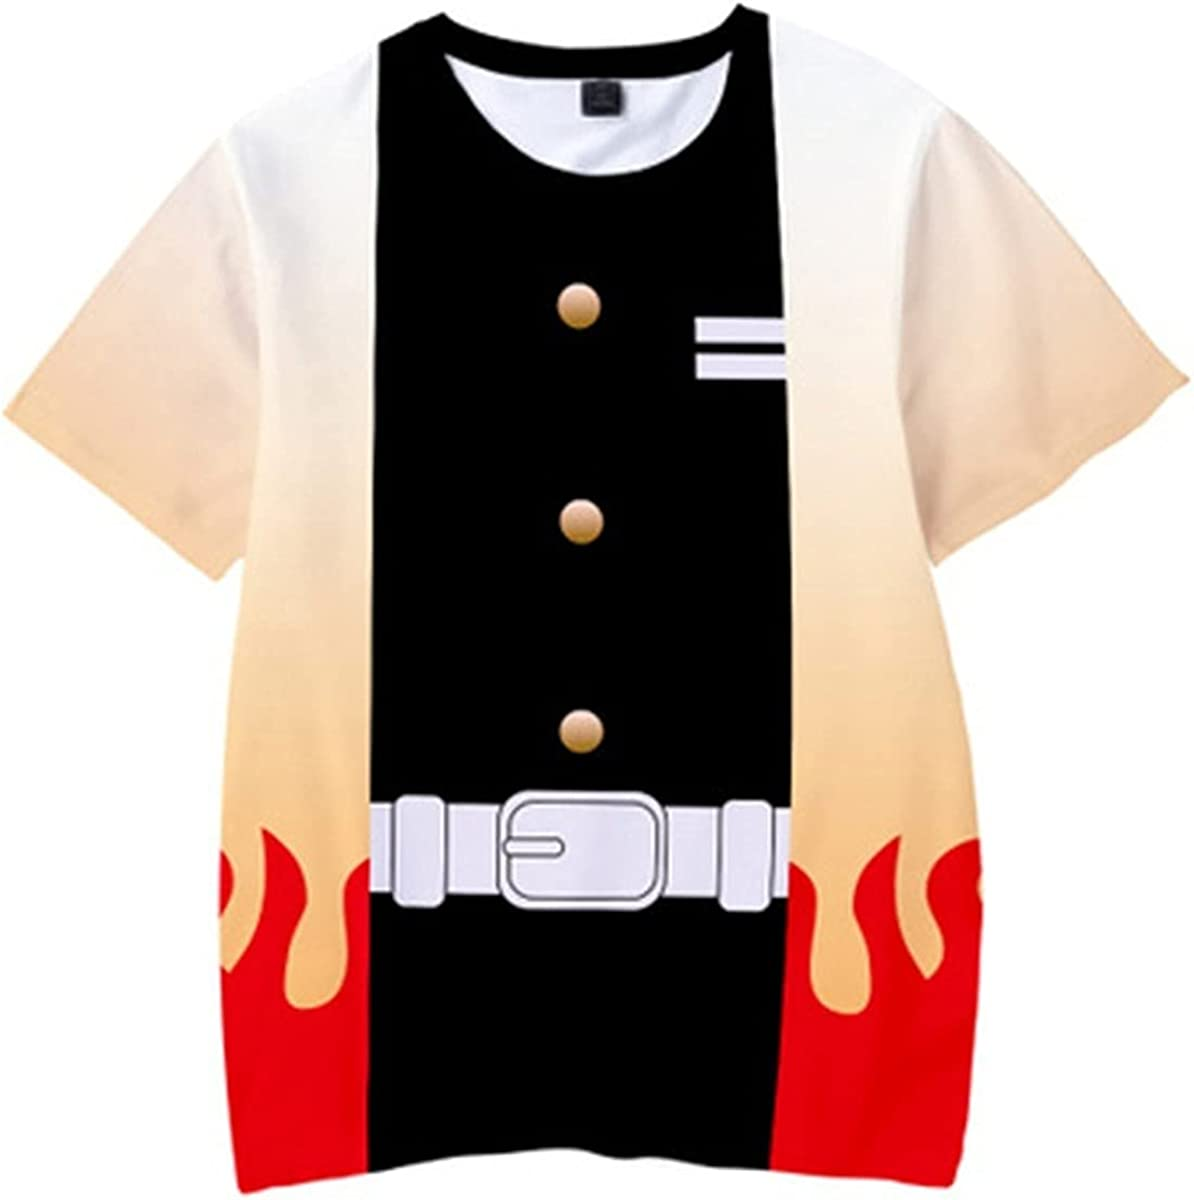 Southern Beauty Girls and Boys Anime Unisex Demon Slayer 3D Printing Fashion T-Shirt